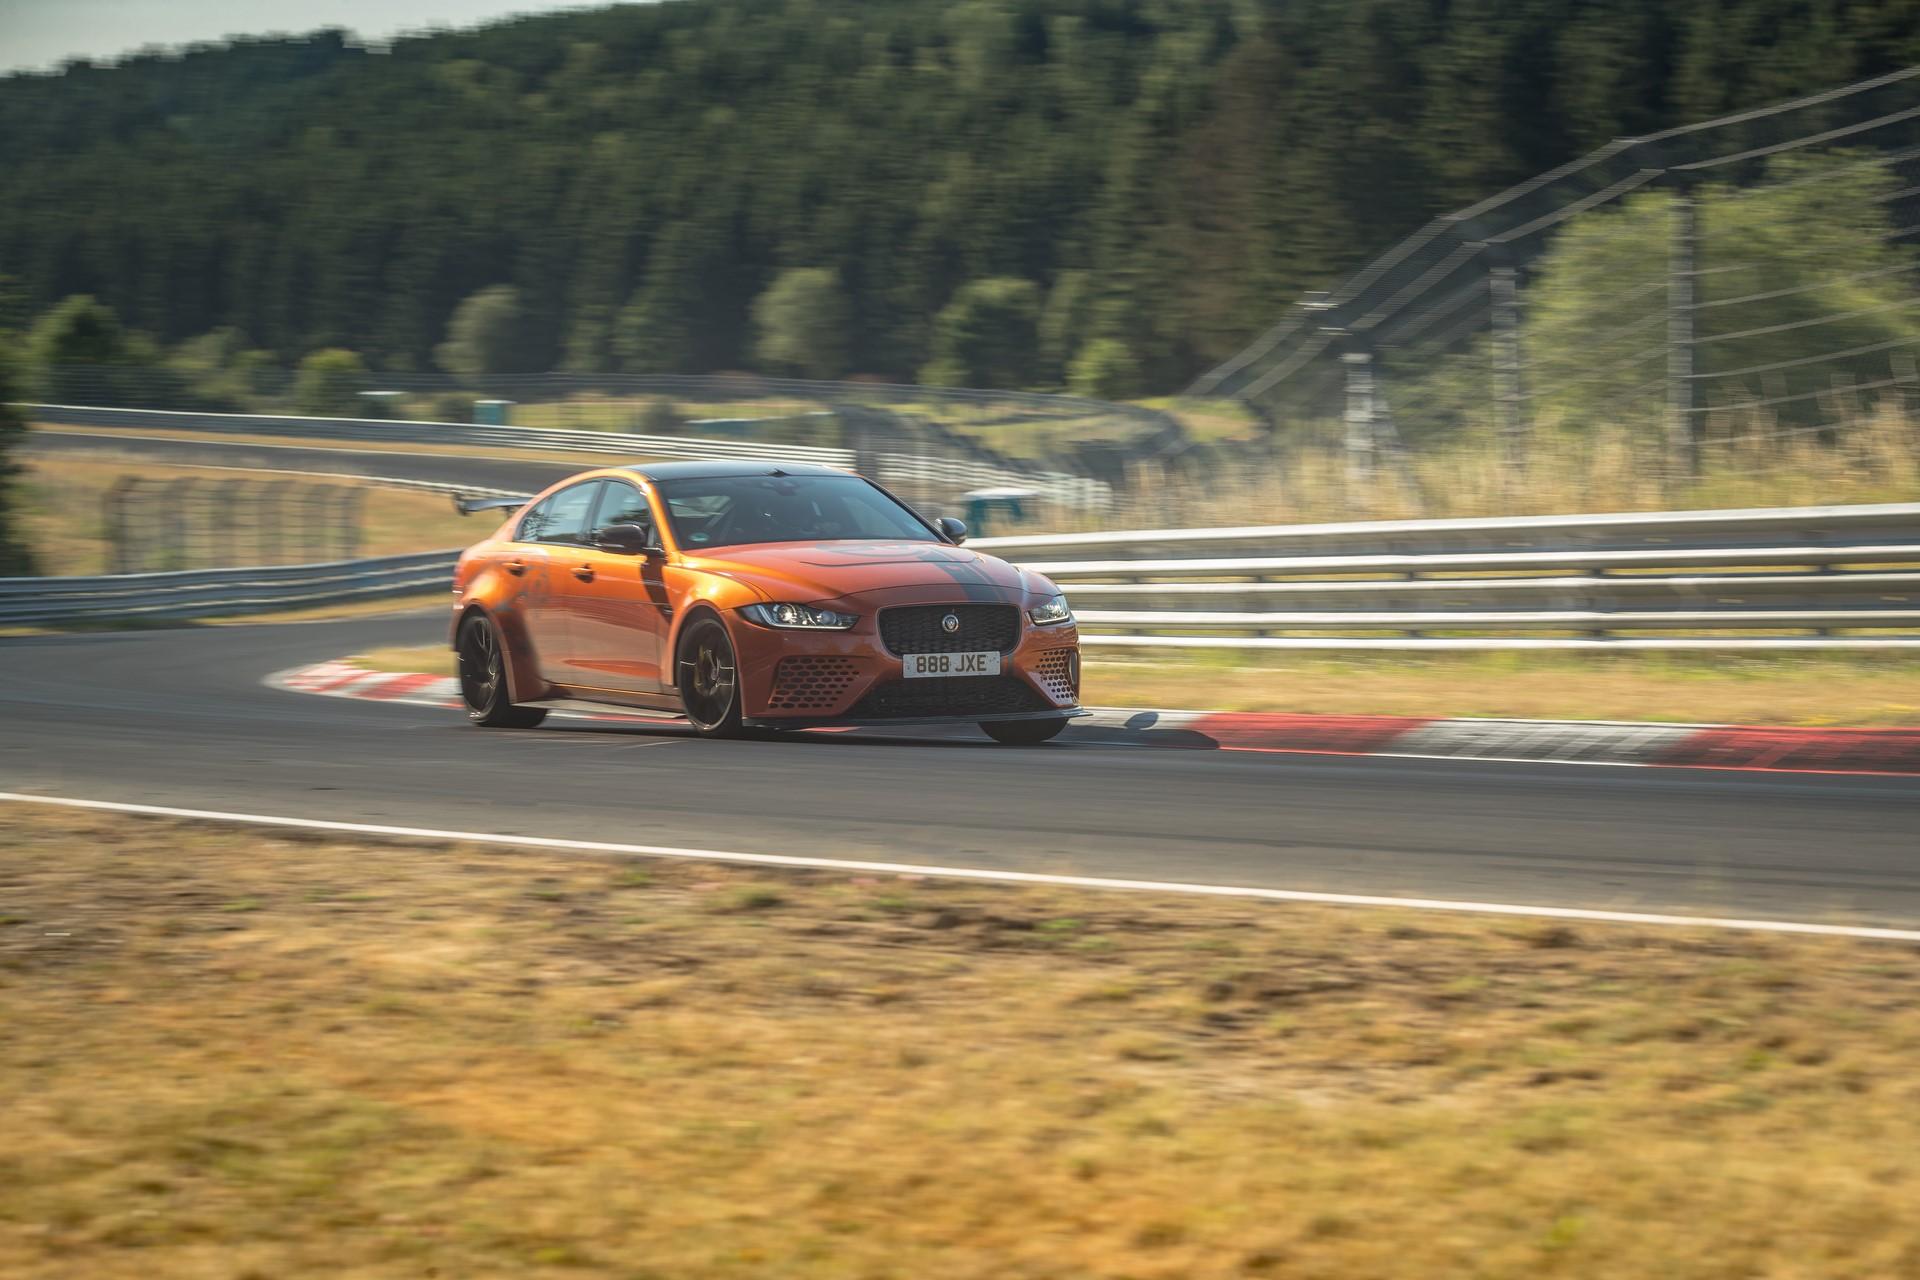 Jaguar-XE-SV-Project-8-new-Nurburgring-record-5